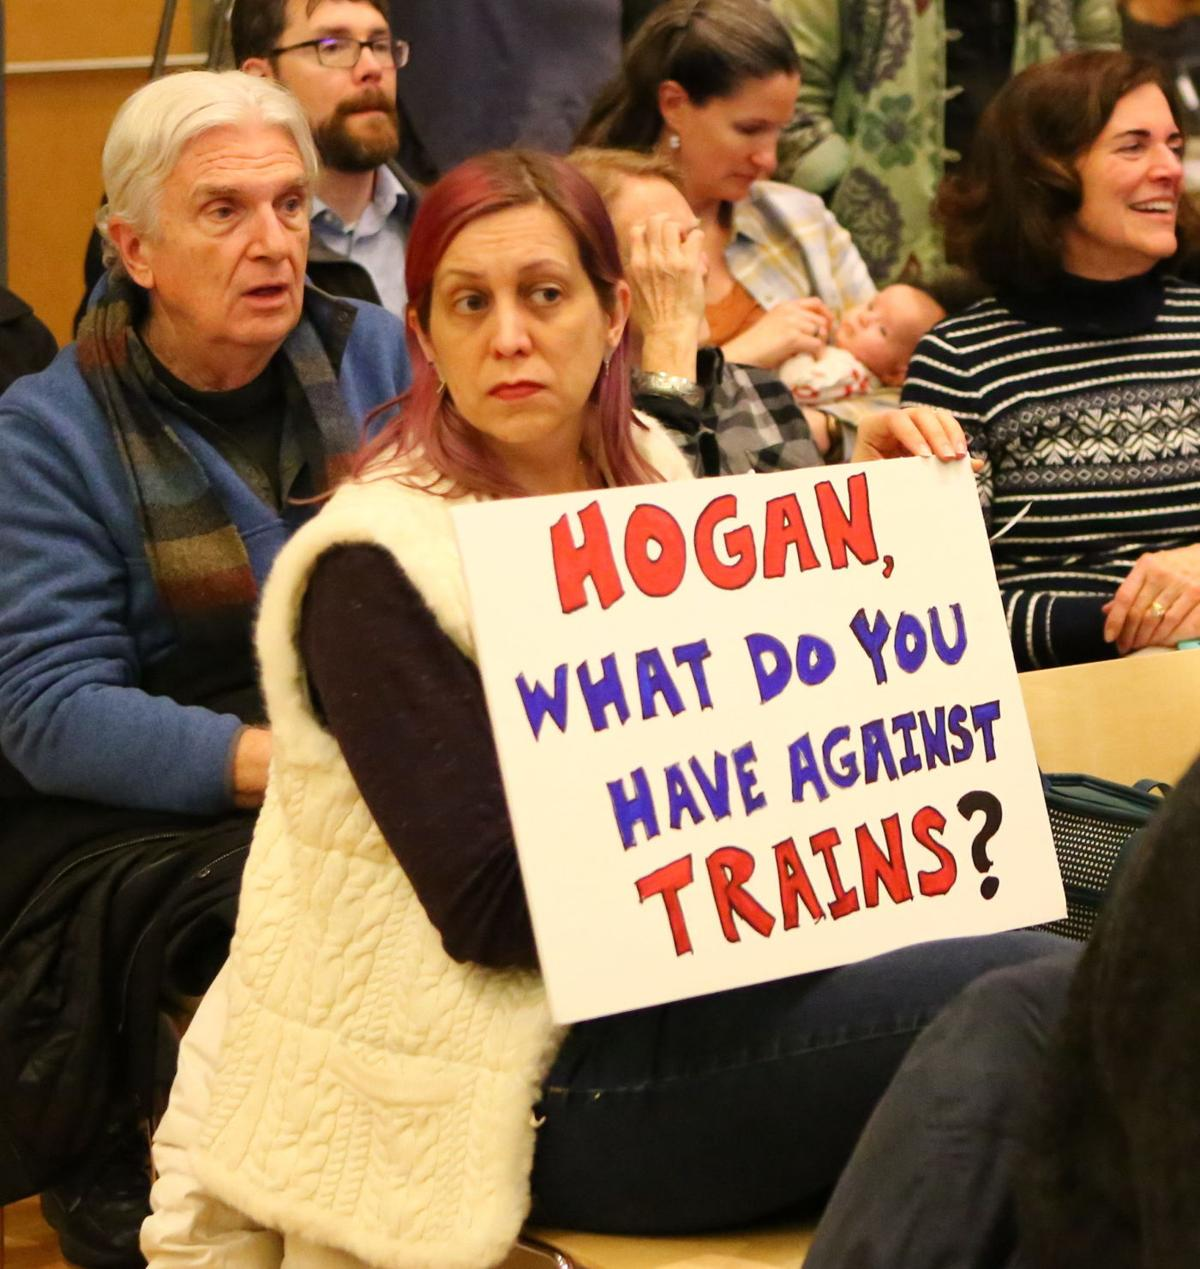 HOGAN vs TRAINS